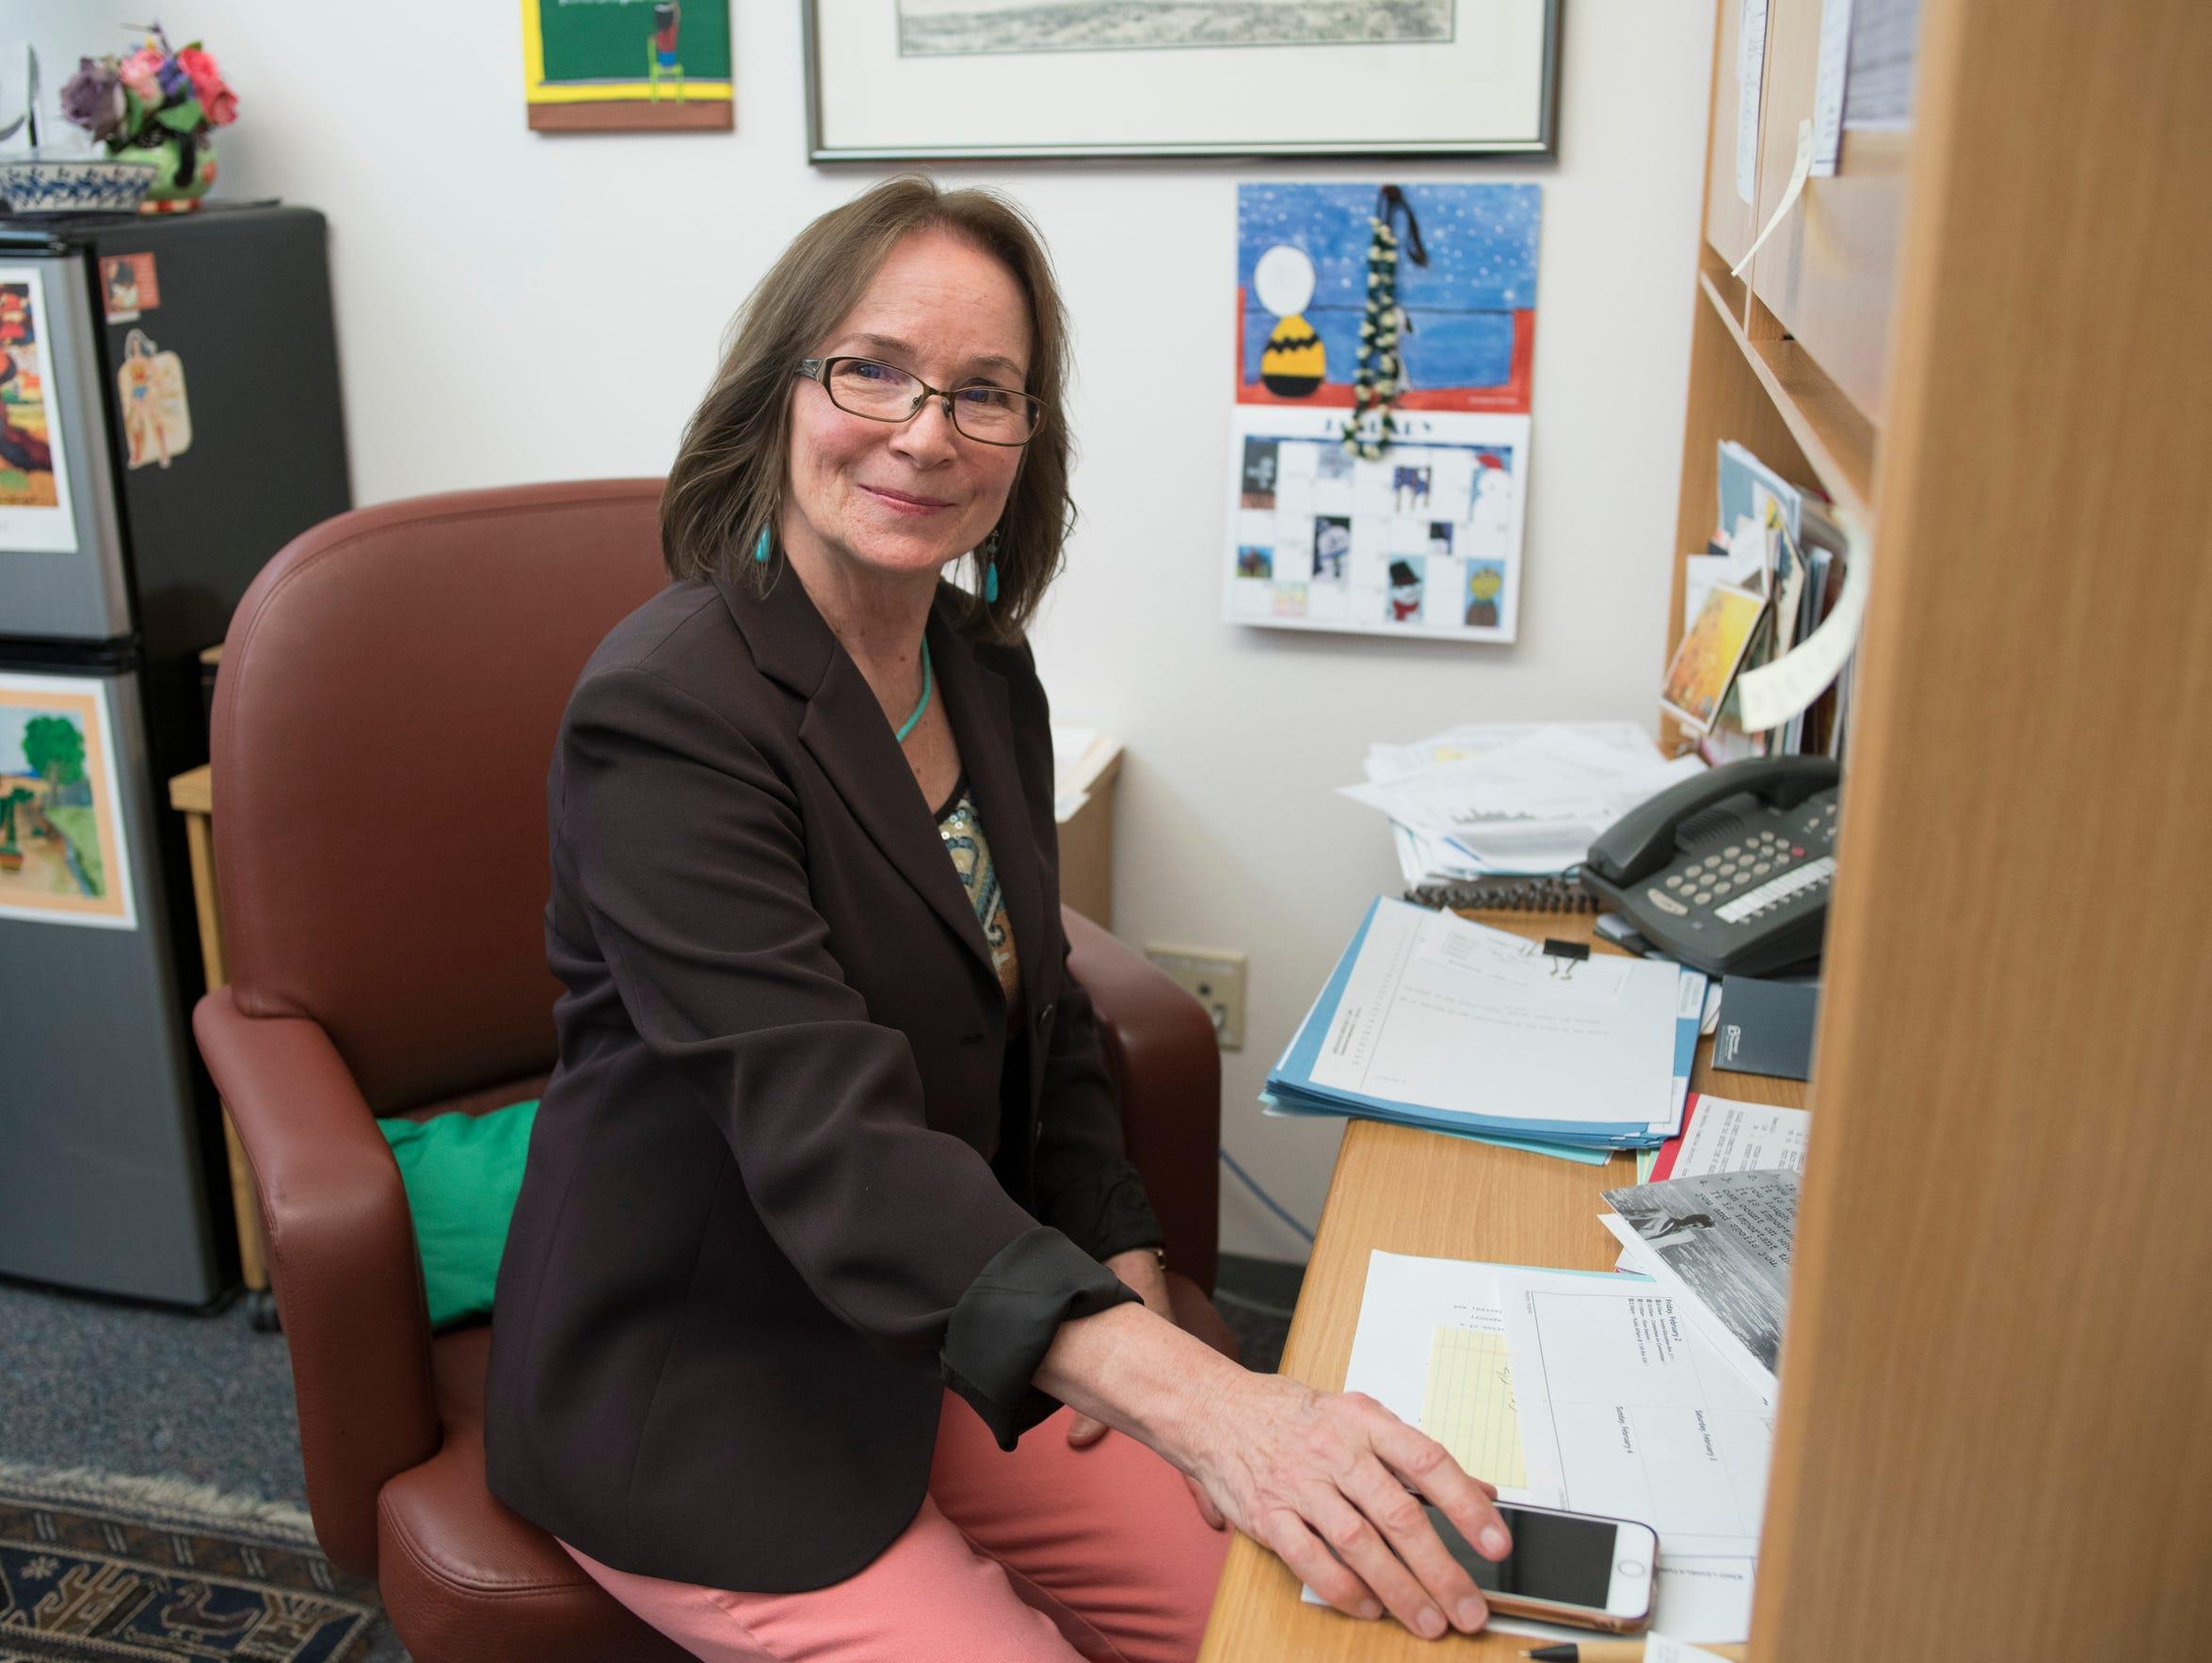 Mimi Stewart, New Mexico Senate majority whip, at the